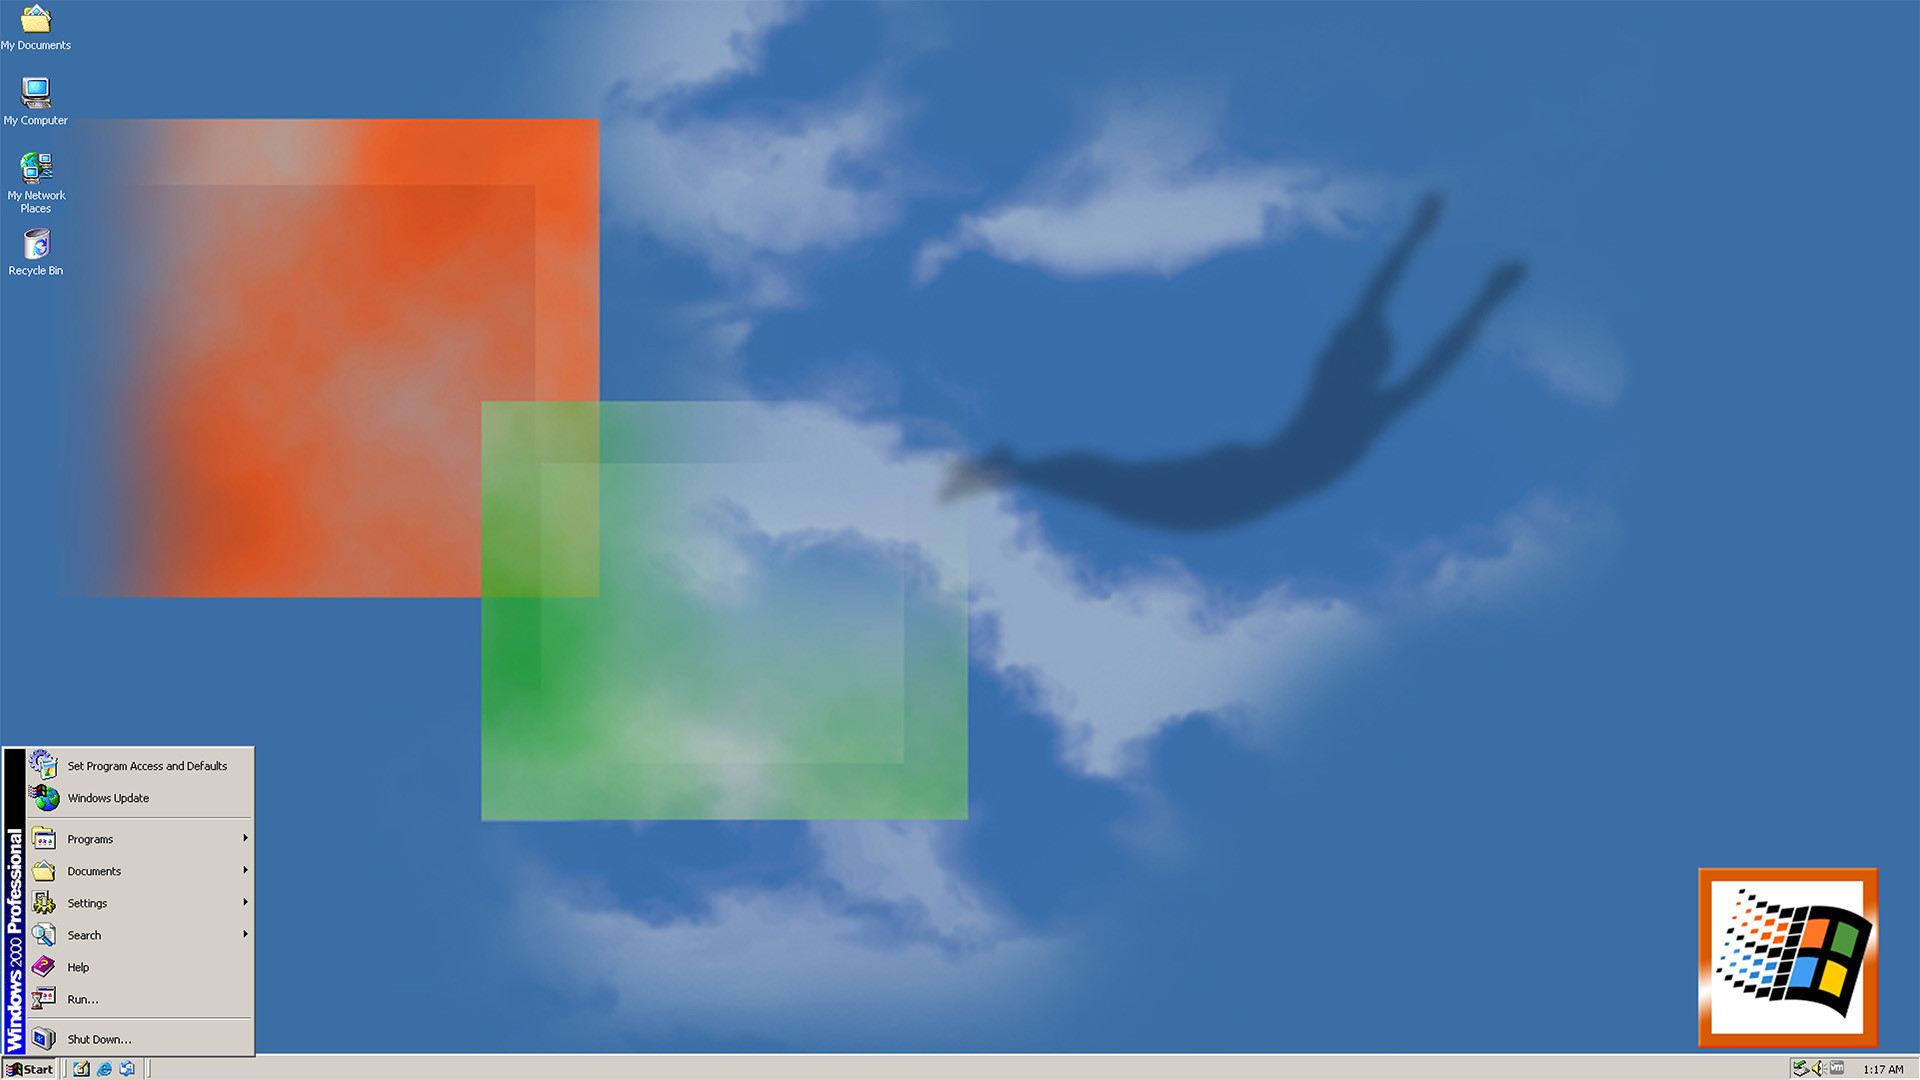 3d Hd Vaporwave Wallpaper Windows 95 Wallpaper 67 Images